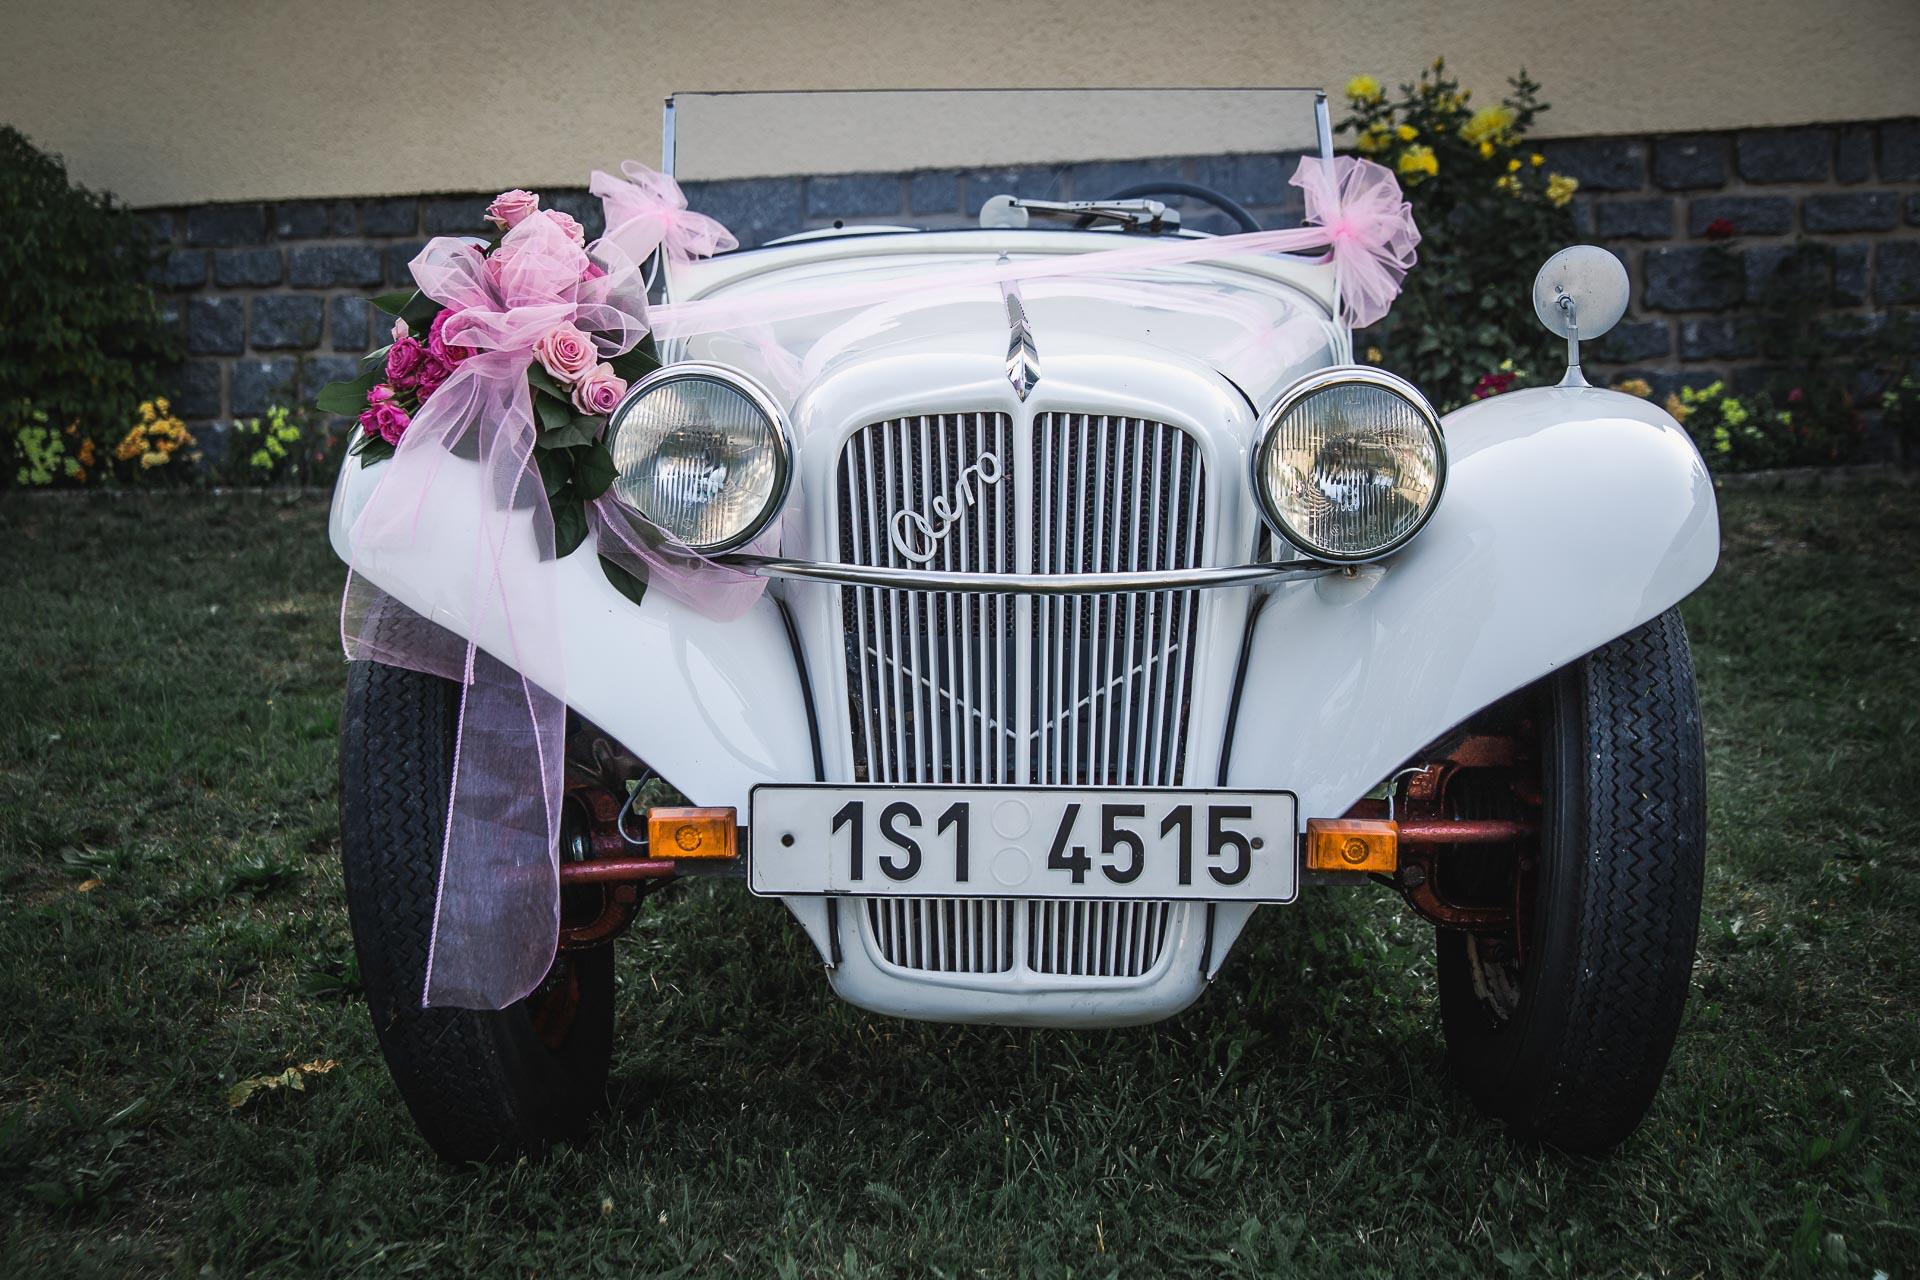 svatební-fotograf-wedding-svatebni-video-orlík-vltava-kostel-statek-stodola-boho-svatba-Beautyfoto-73